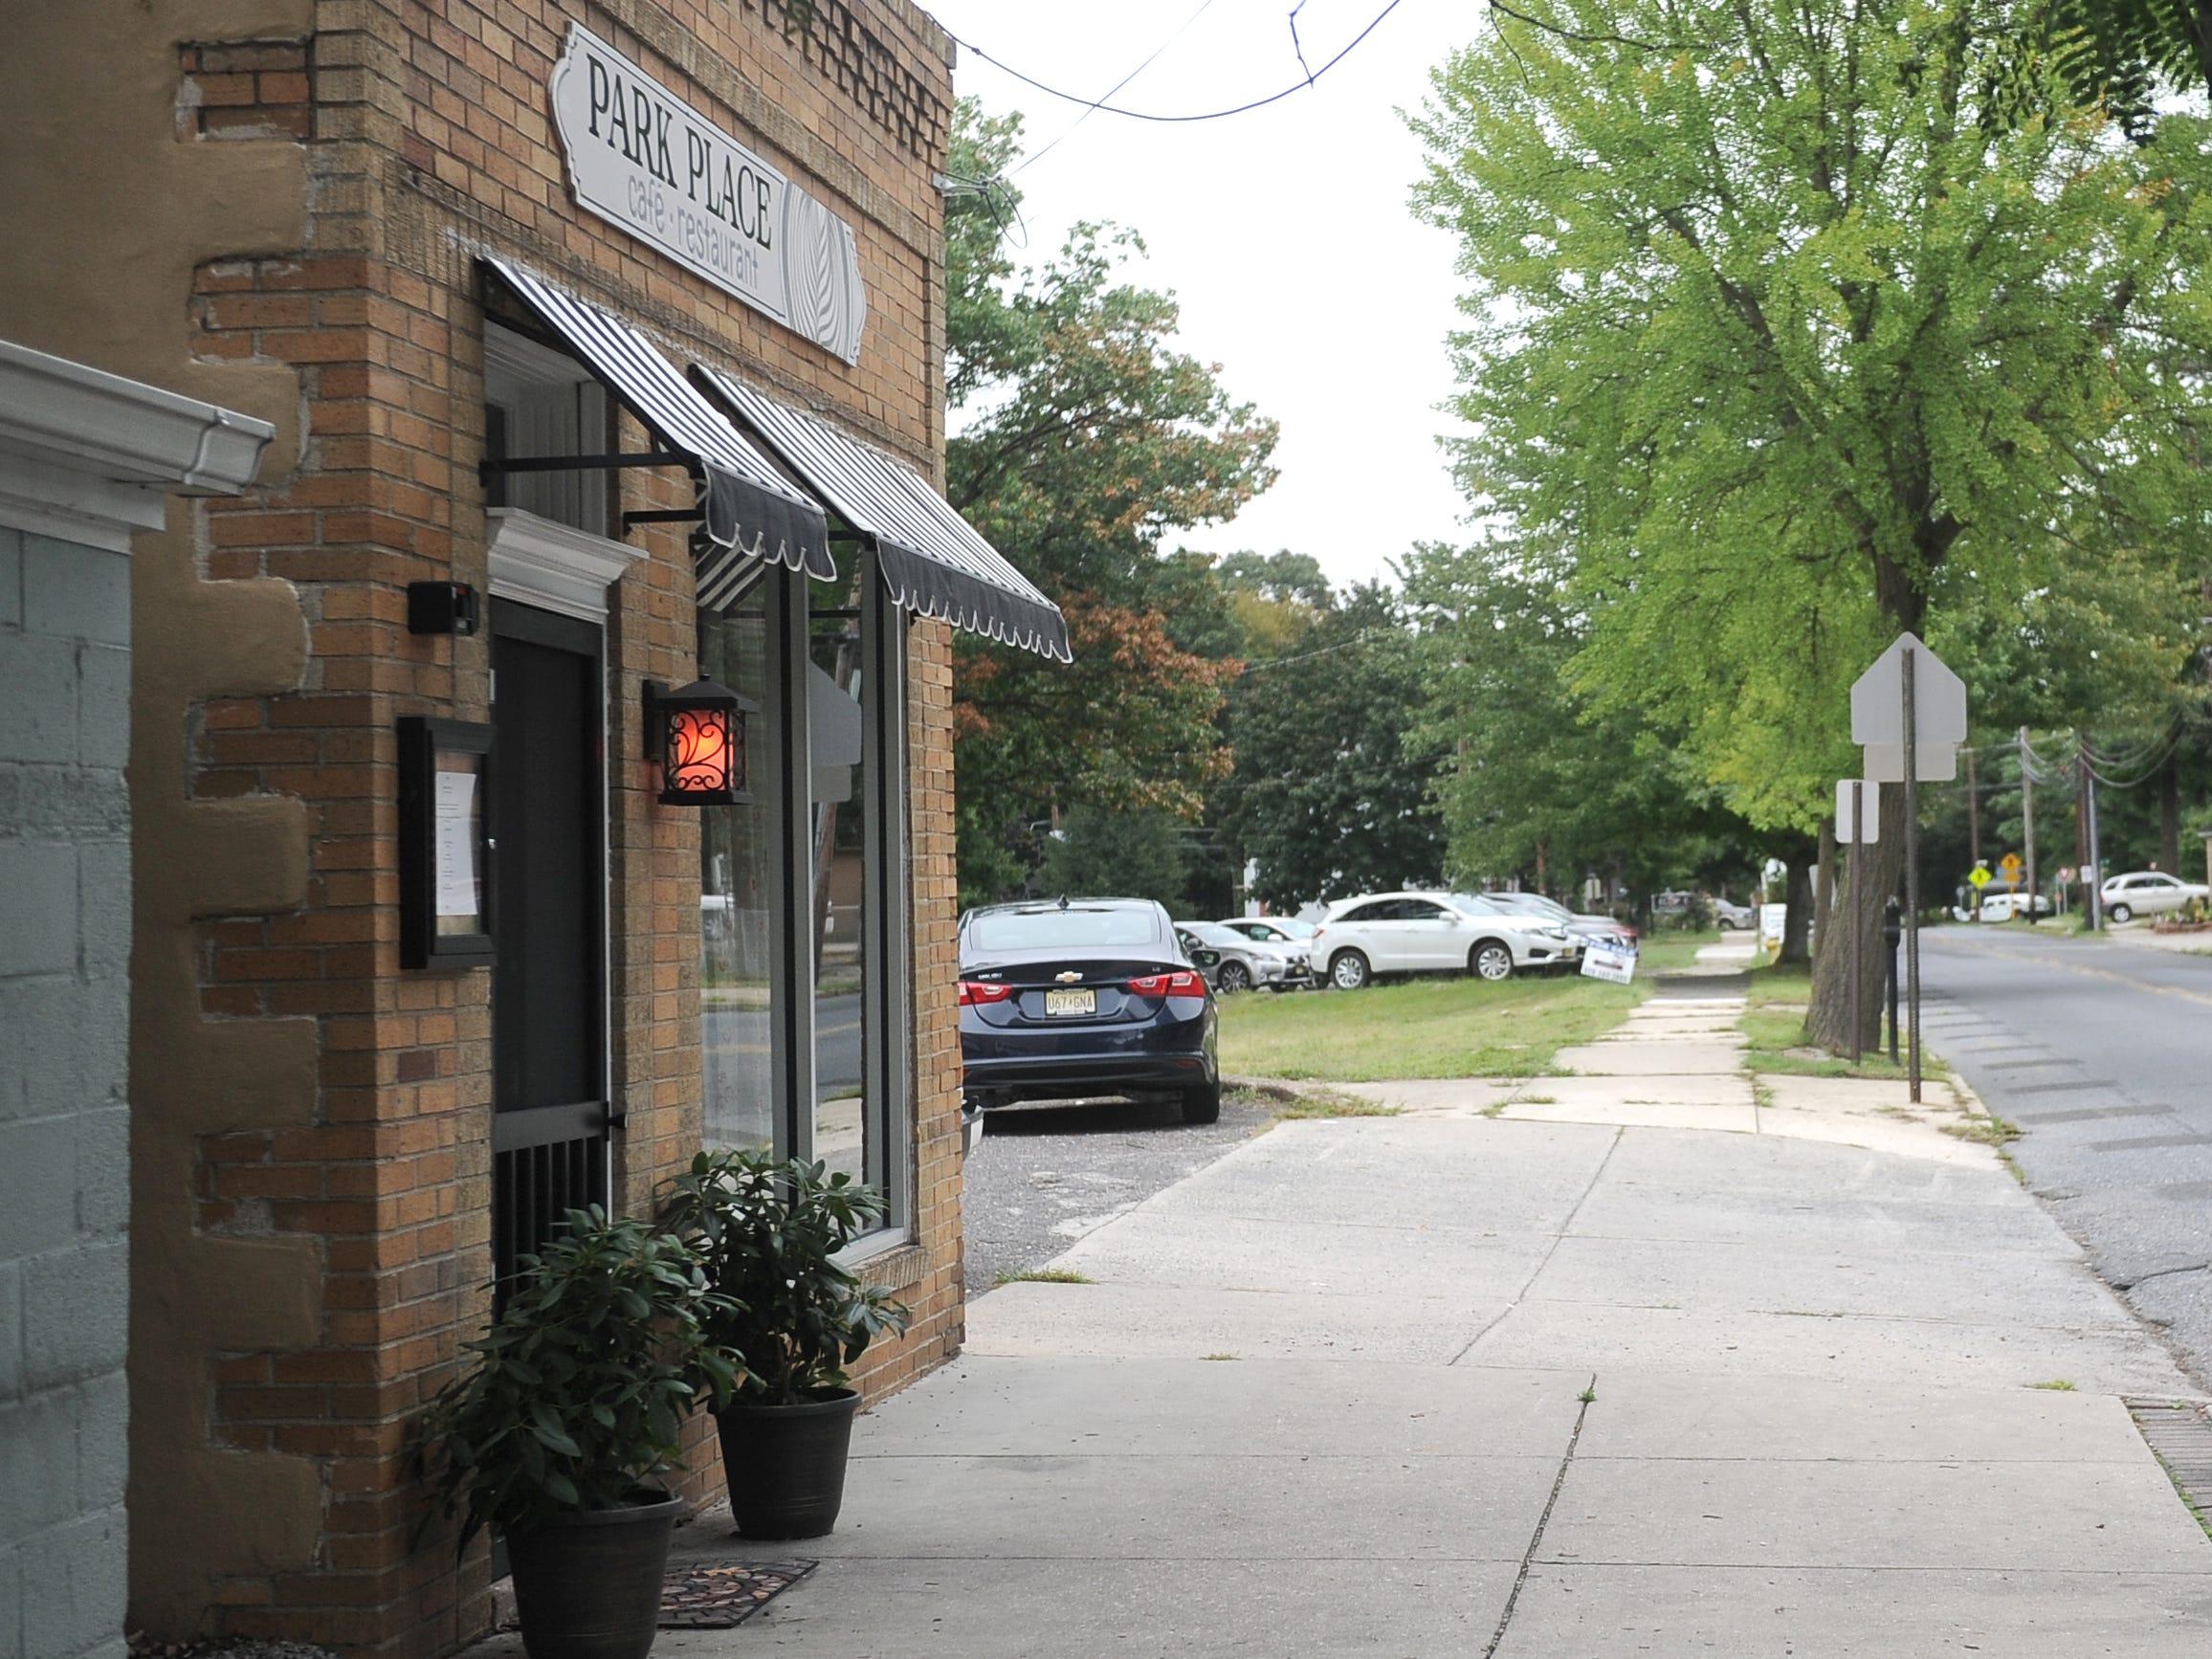 Proposed Merchantville redevelopment area.